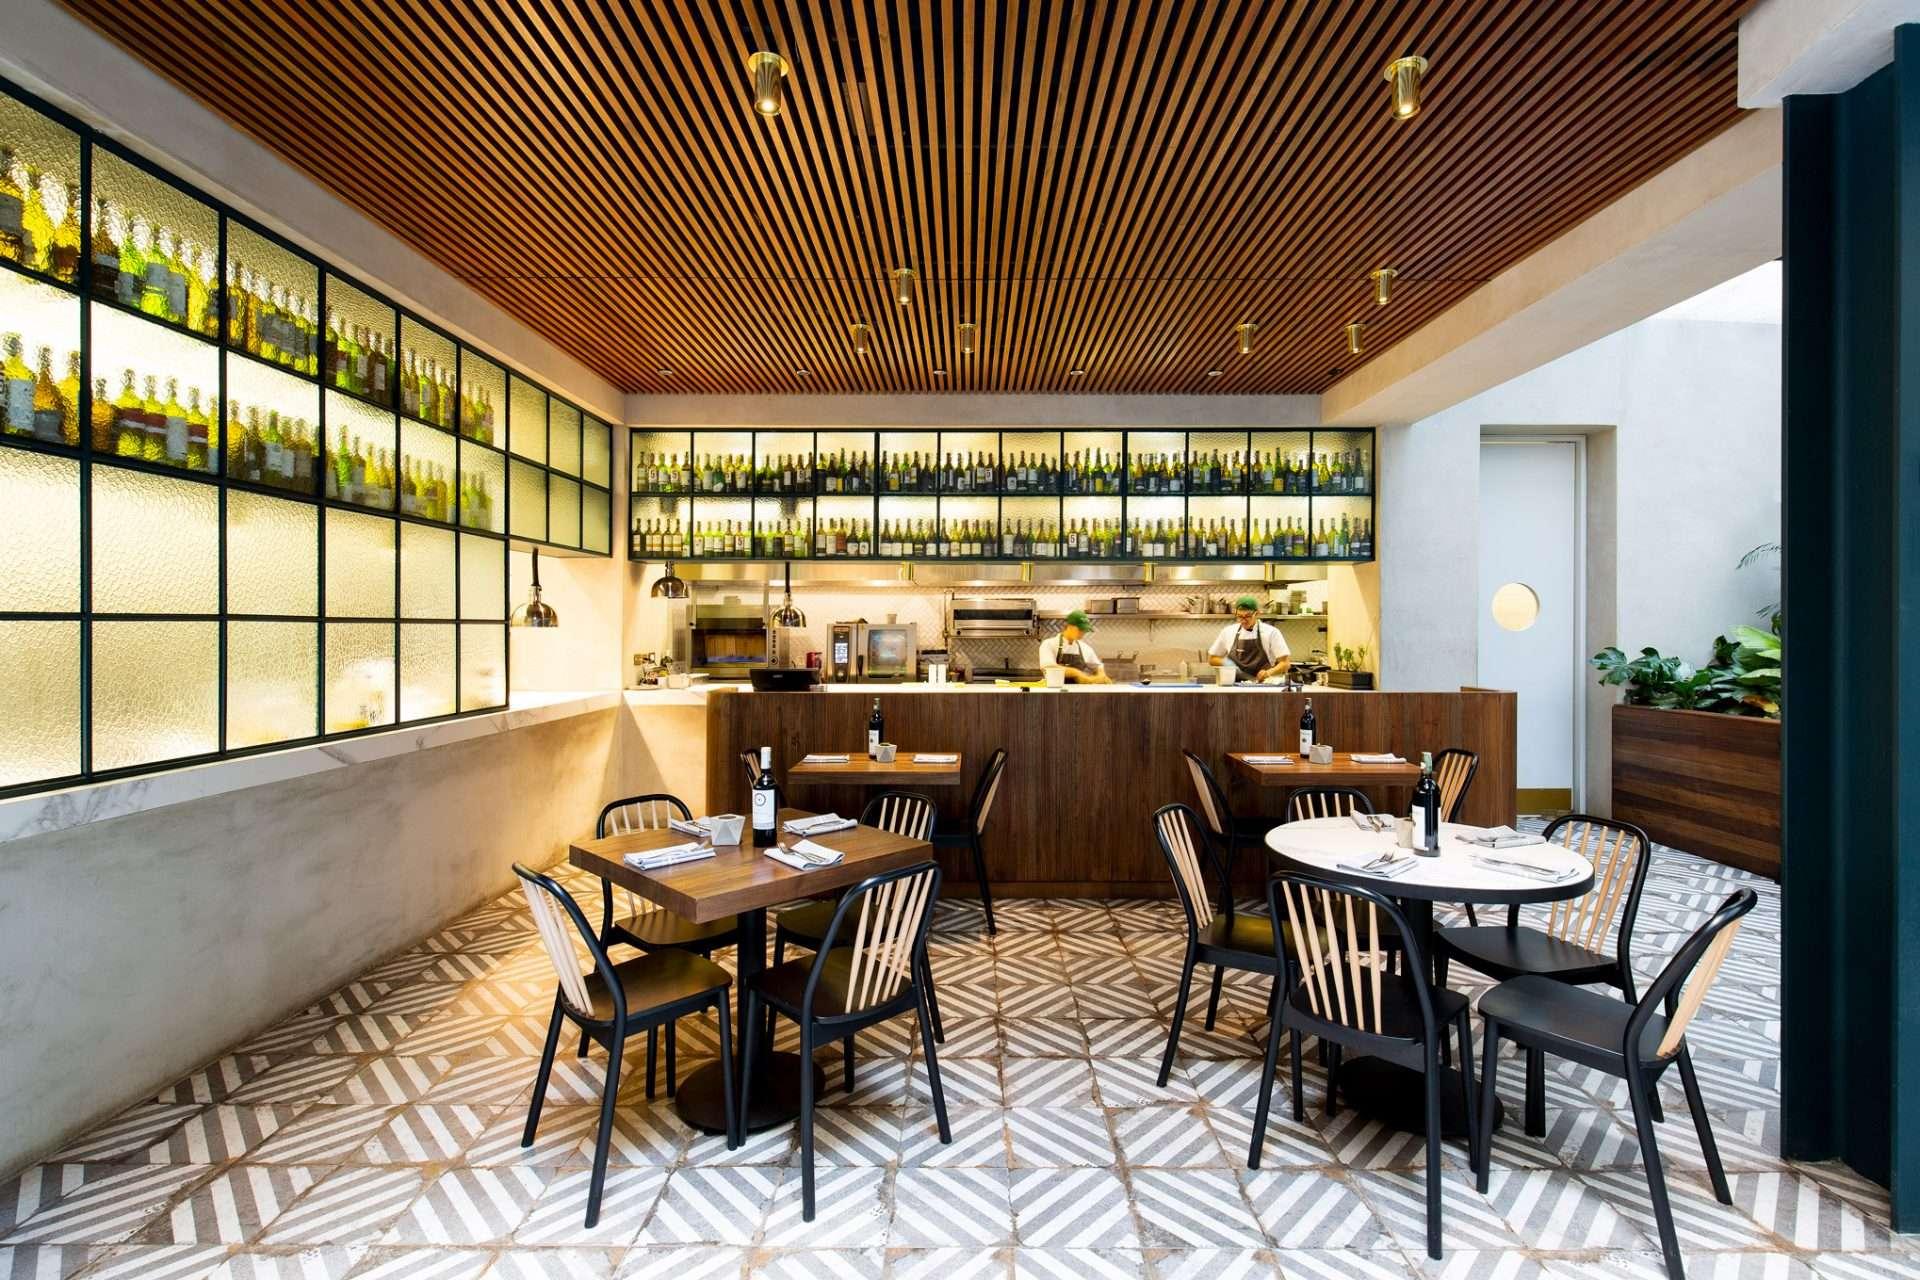 12.gaba.arquitectura.simonboschphotography.interior.architecture.colombia.restaurante.fotografo.arquitectura.bogota